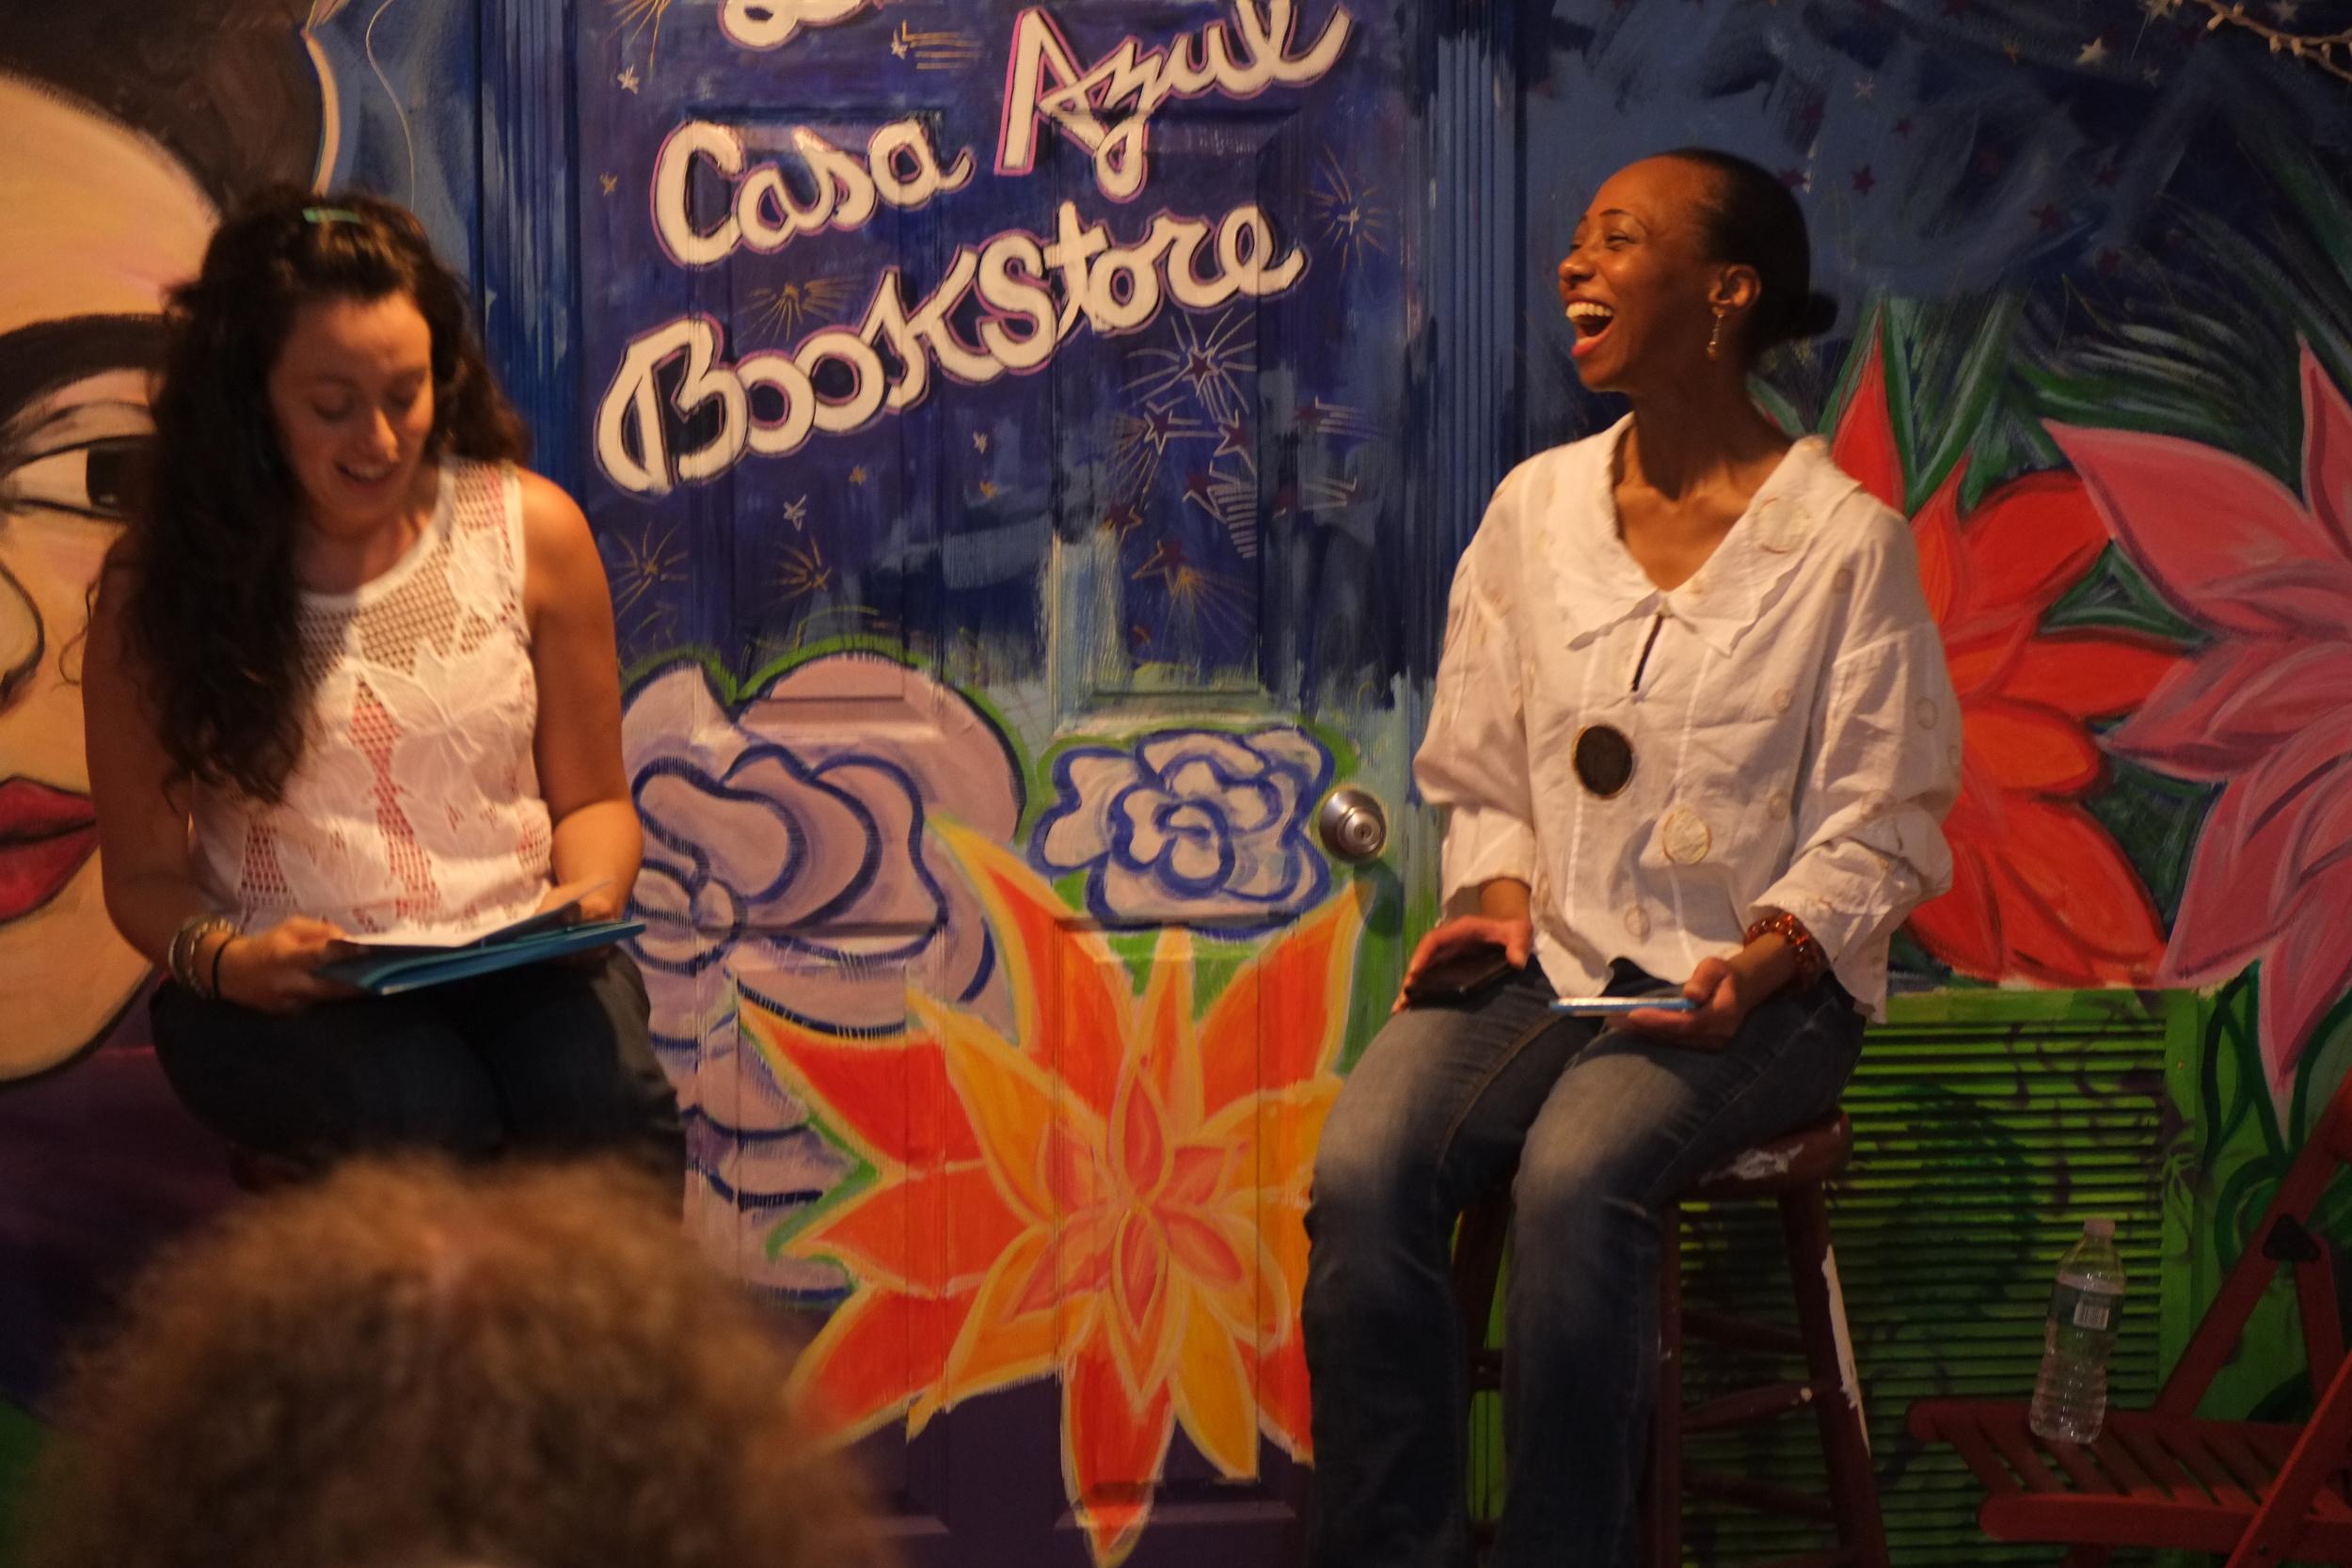 Jennine Capo Crucet and Laura Pegram